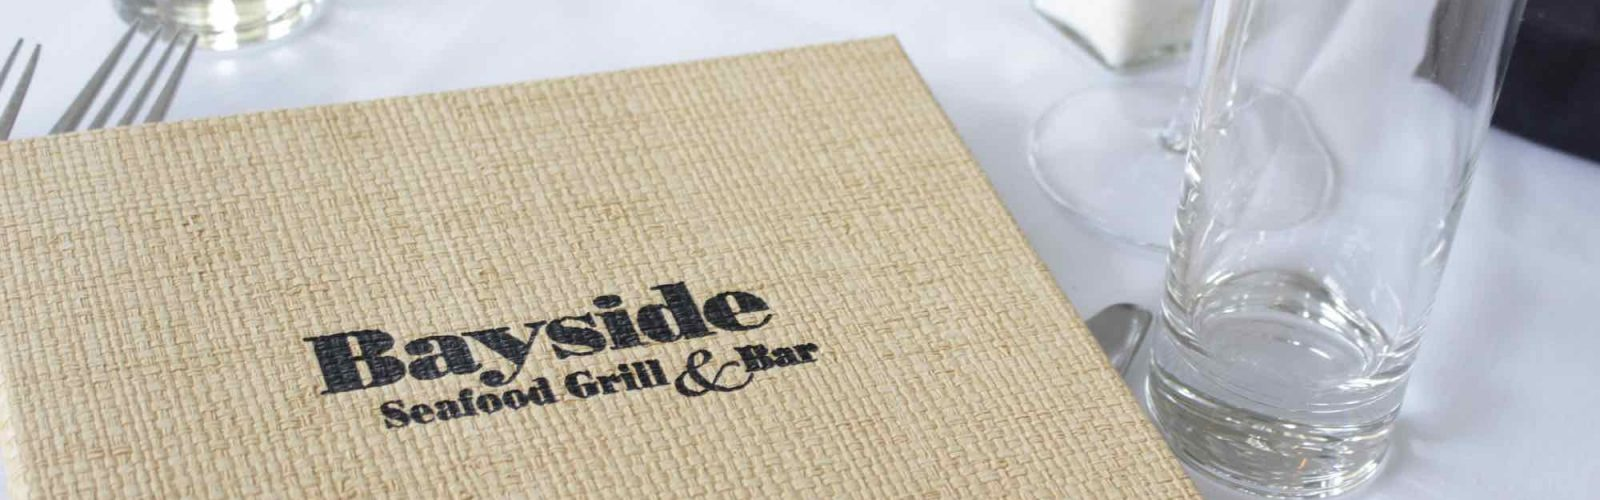 Bayside Grill dinner menu on table